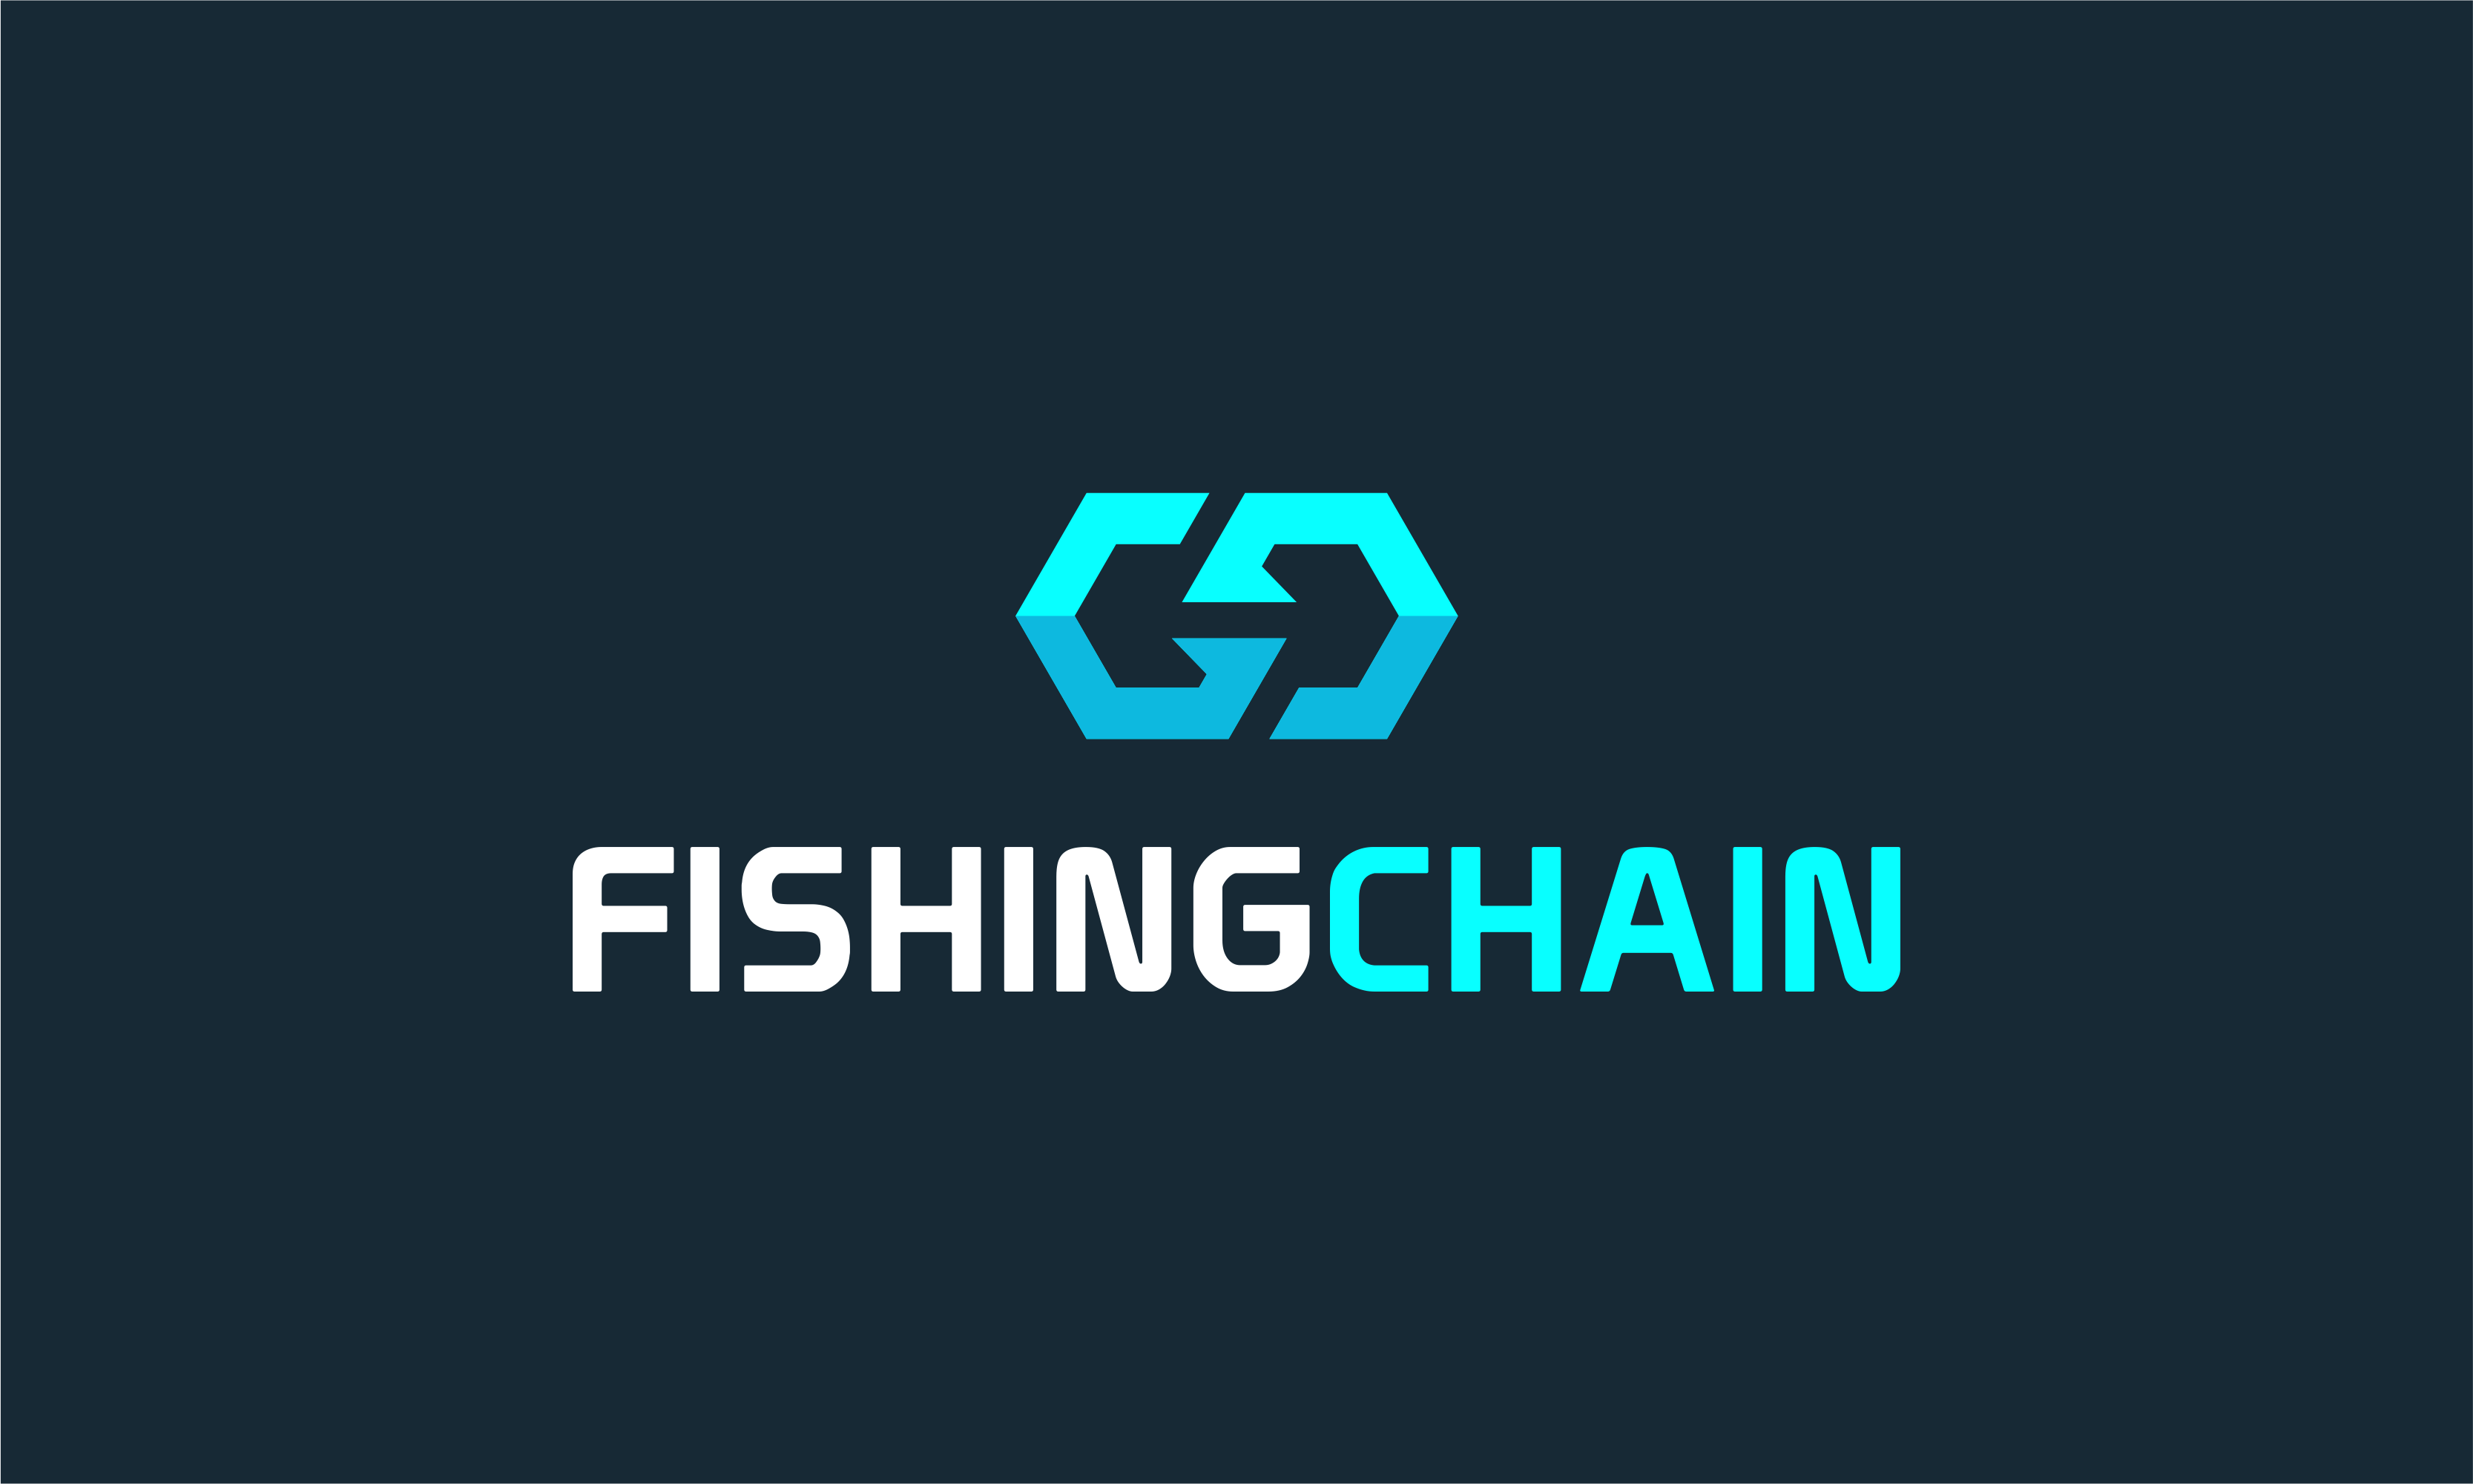 fishingchain